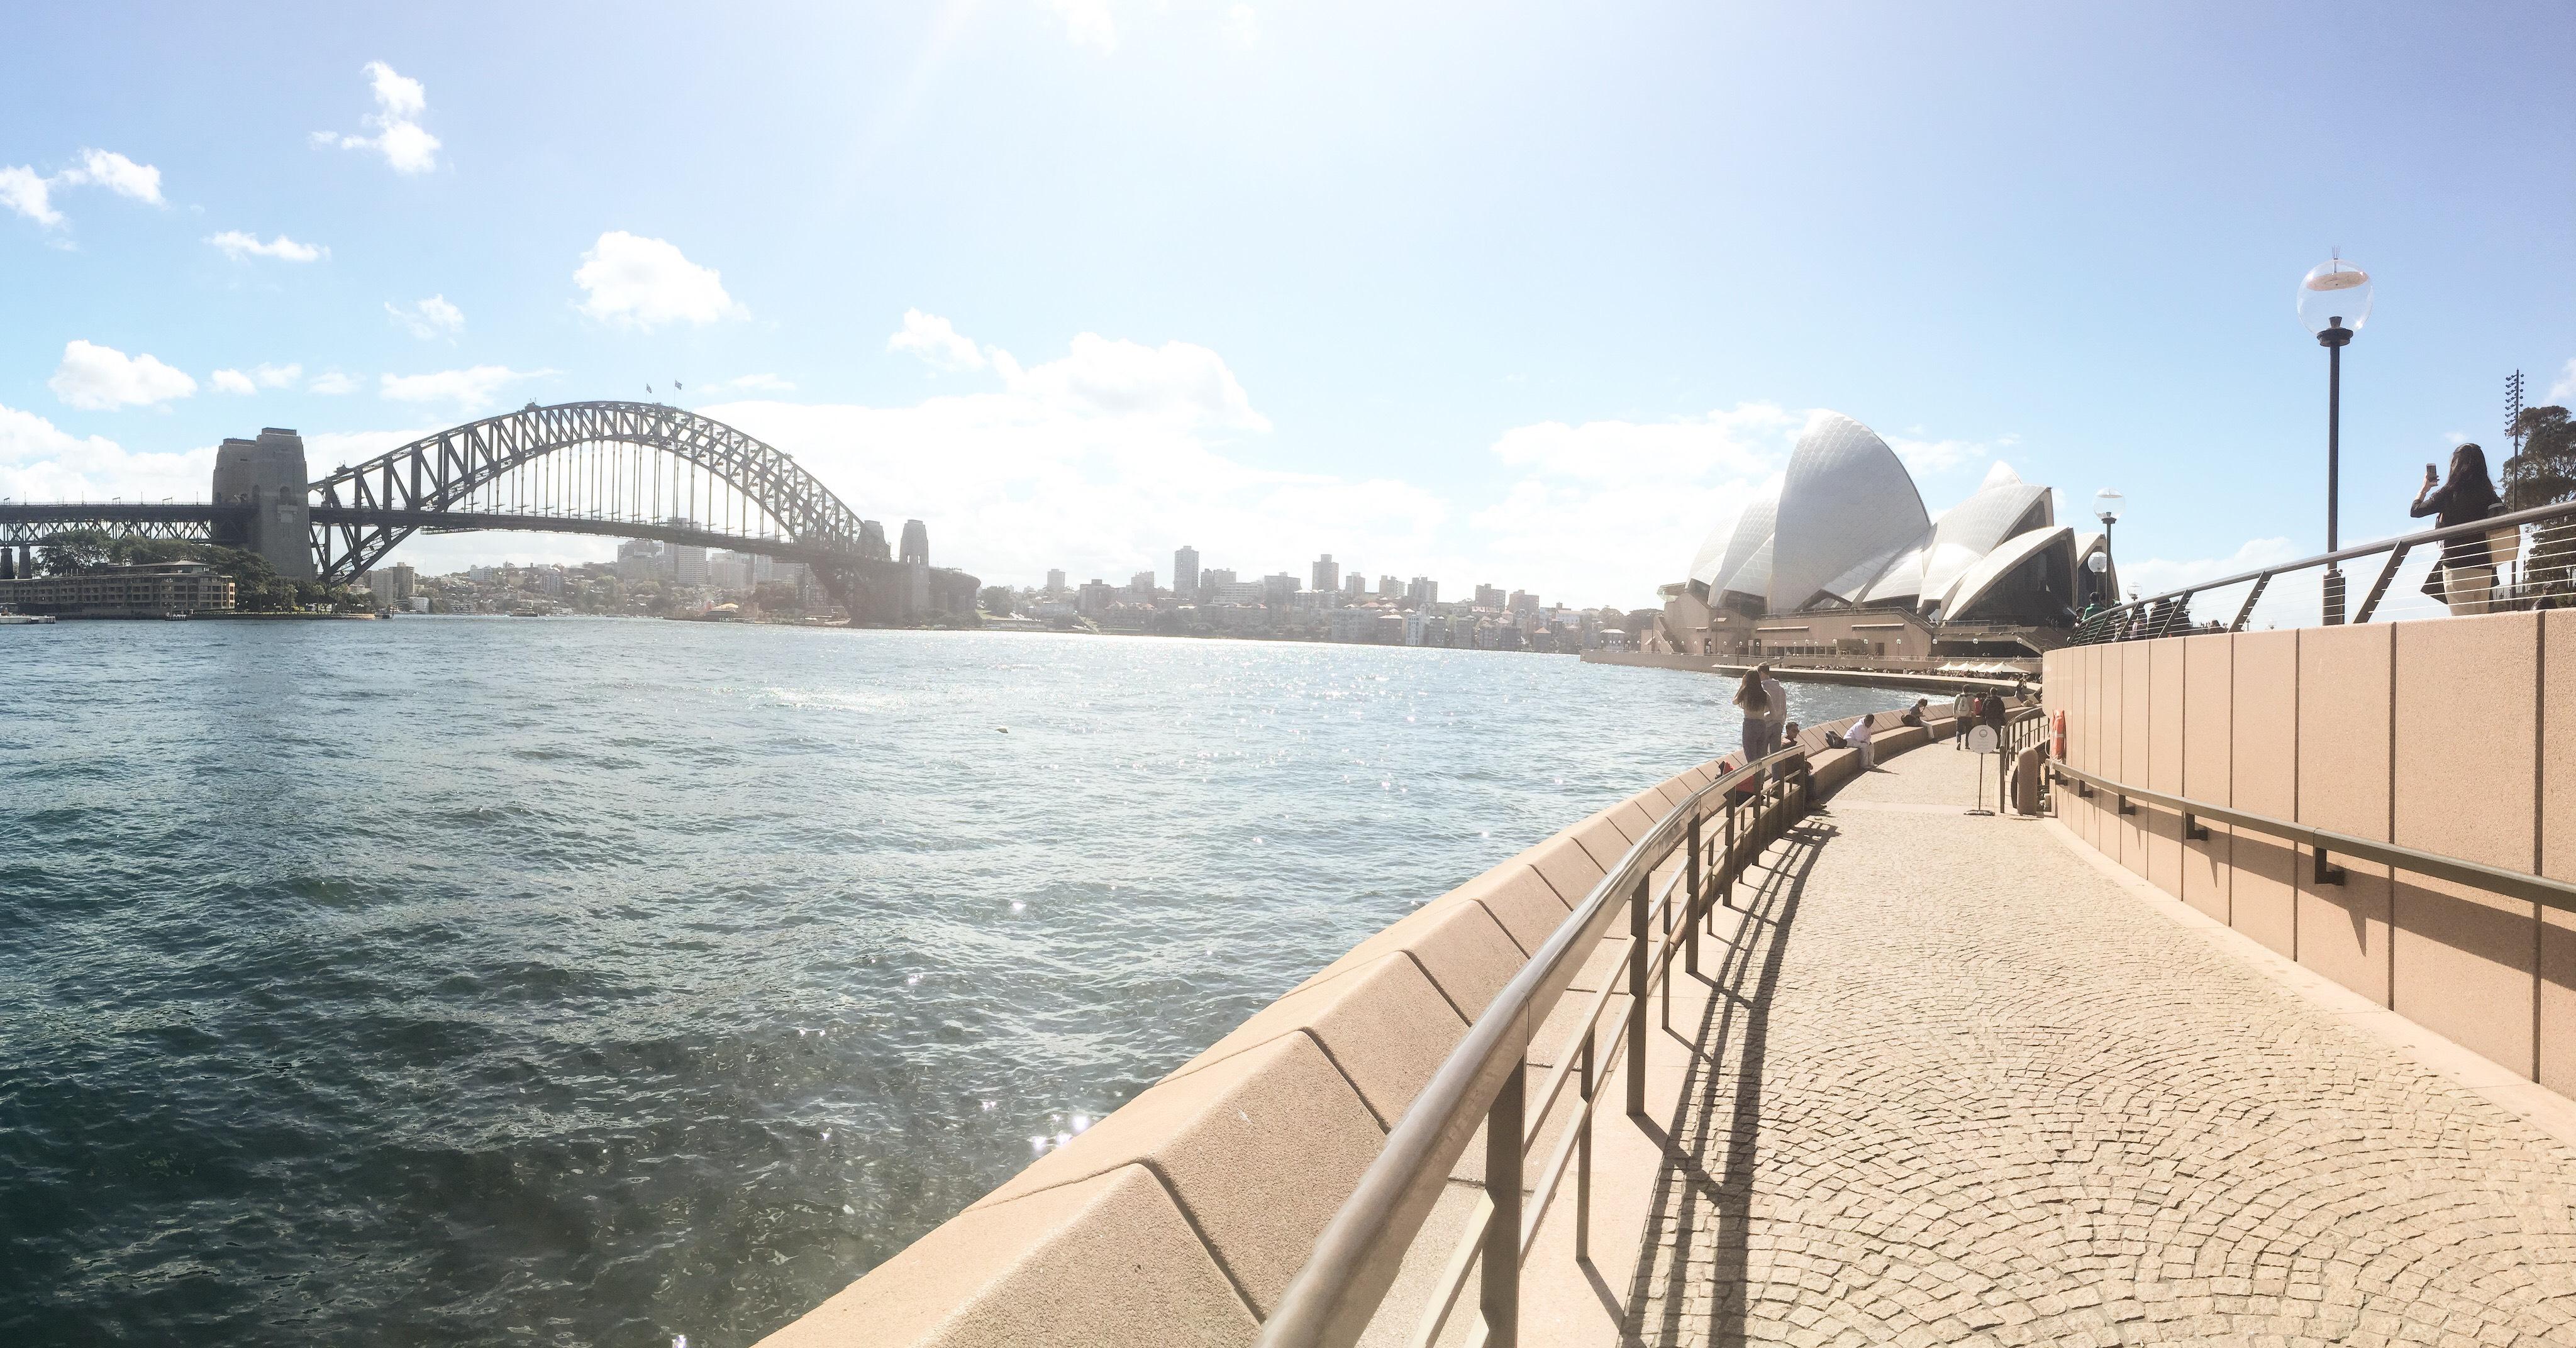 CAPAStudyAbroad_Sydney_Fall2017_From Hanna Okhrimchuk - Sydney Opera House and Sydney Harbour Bridge.jpg